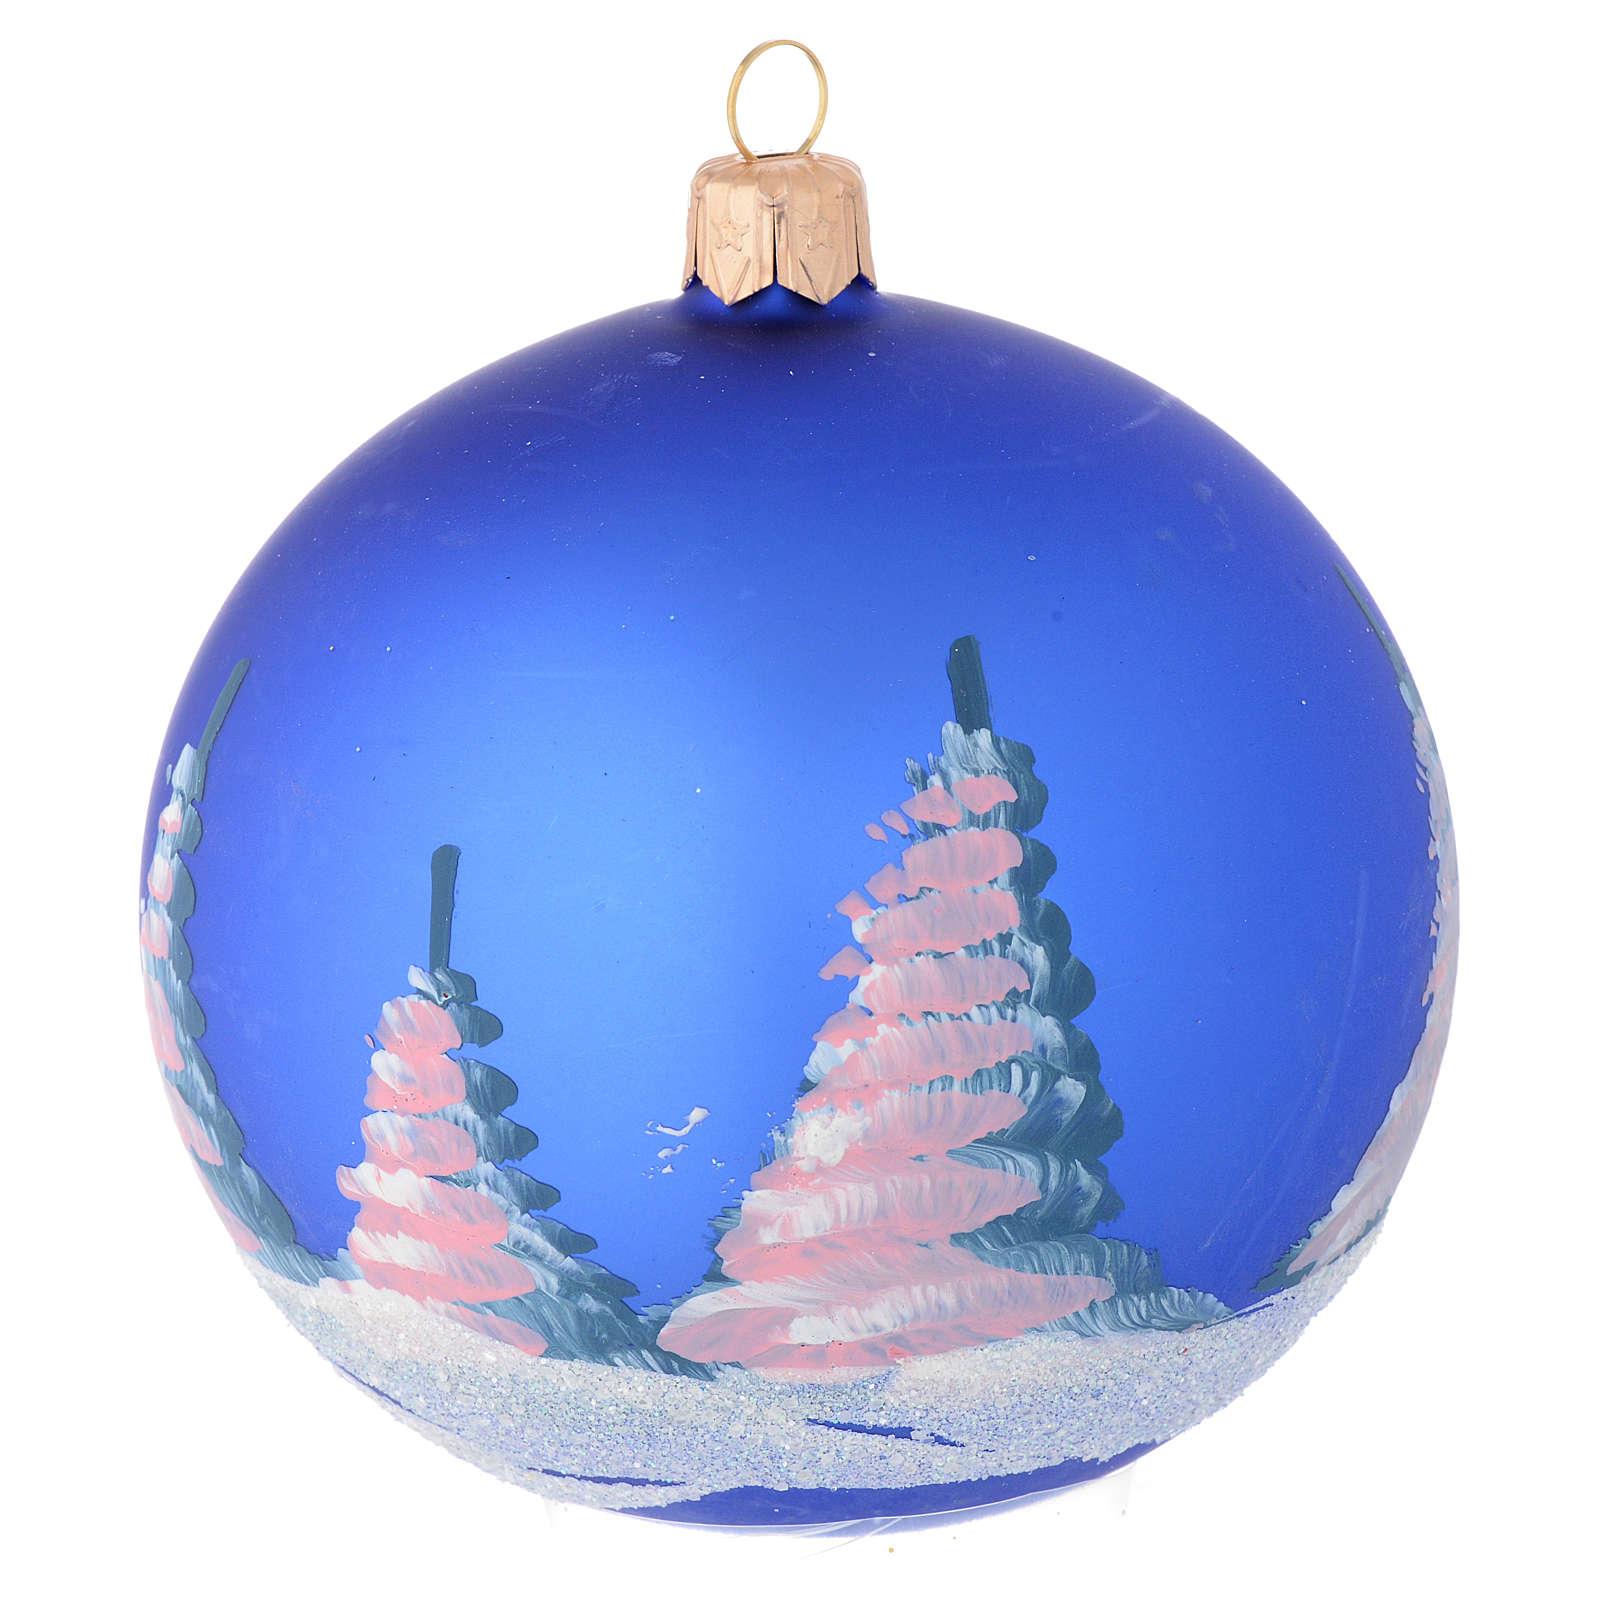 Bola de Navidad vidrio soplado azul paisaje decoupage 100 mm 4